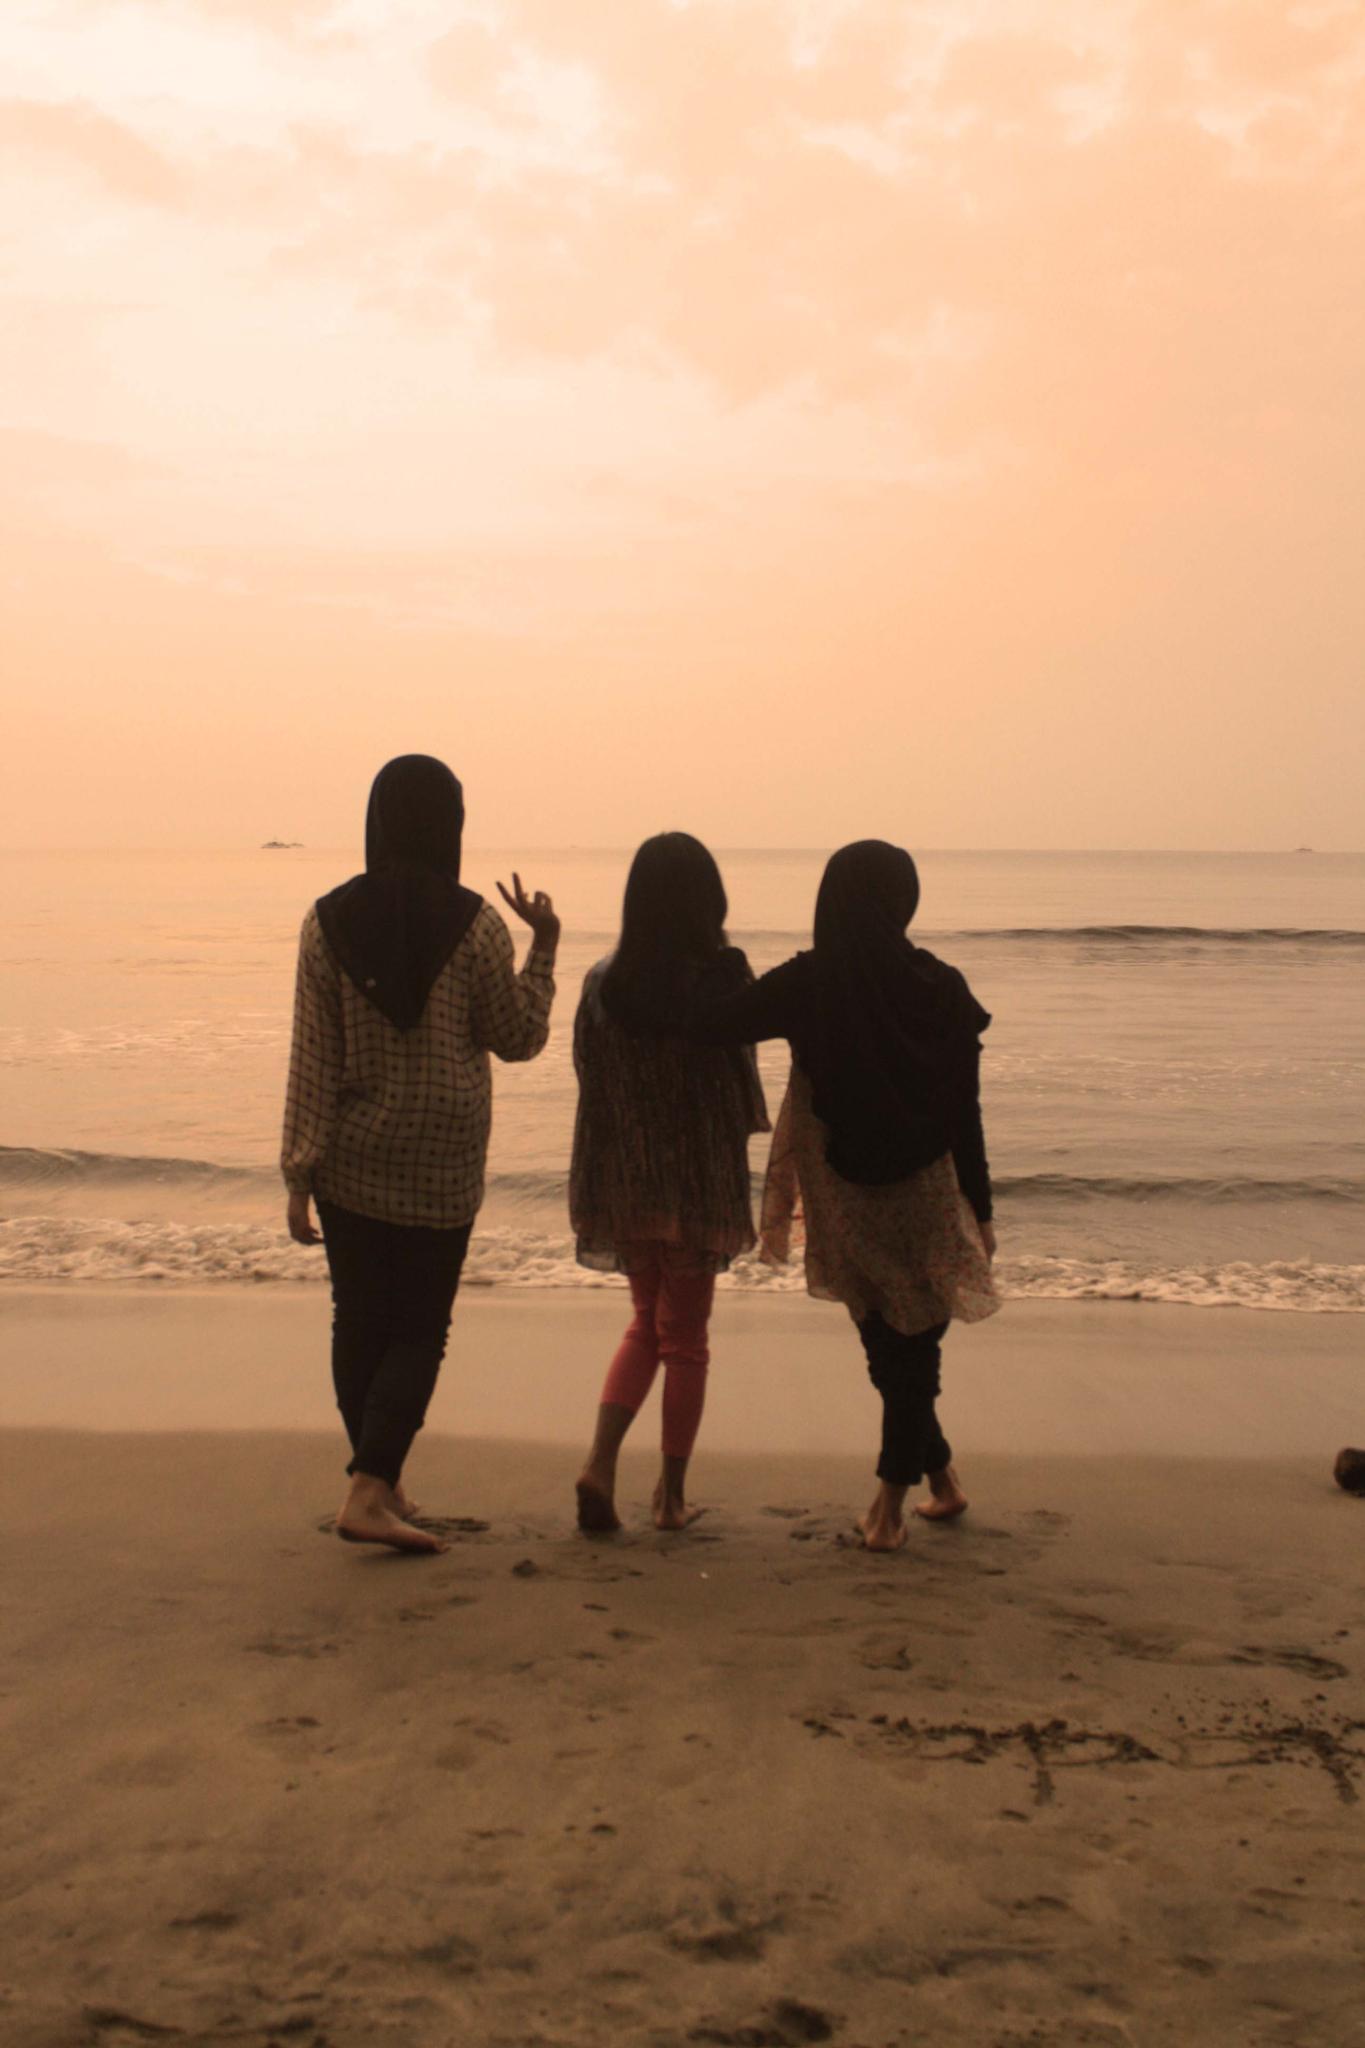 enjoying the sunset on the beach by Zetiawan Aginc